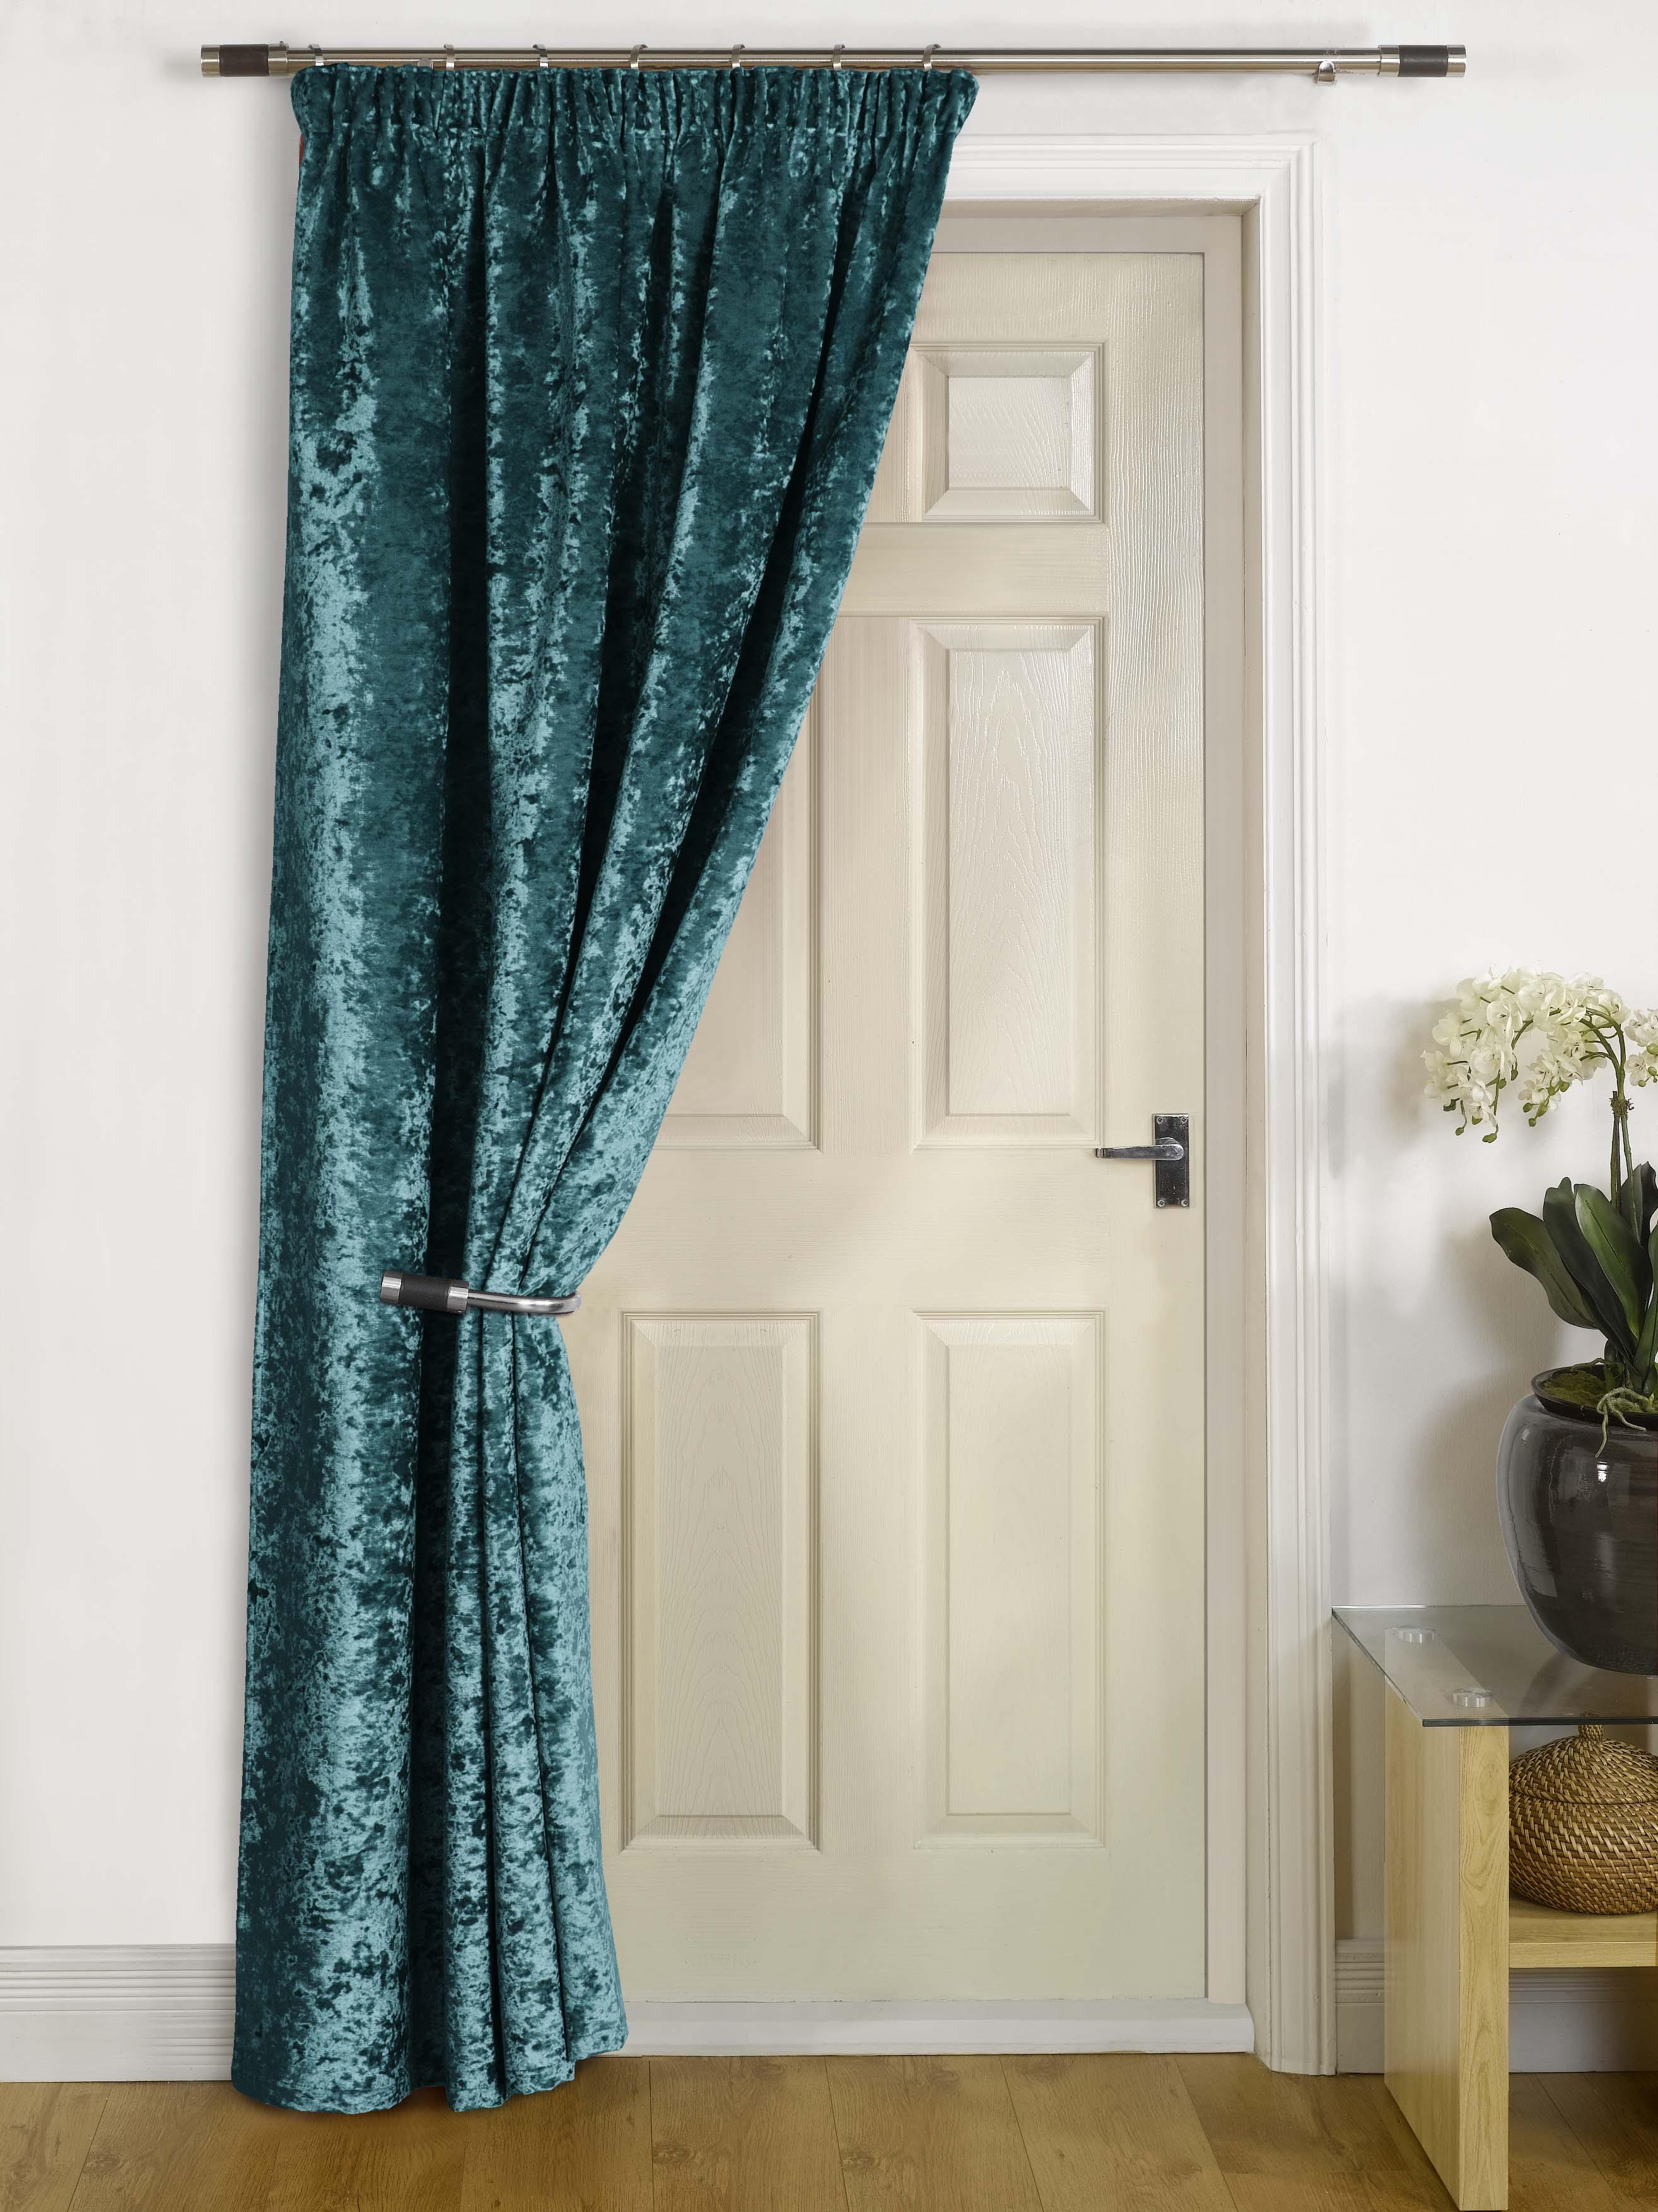 Thermal Lined Door Curtain Quot Rajpur Quot Crush Velvet Self